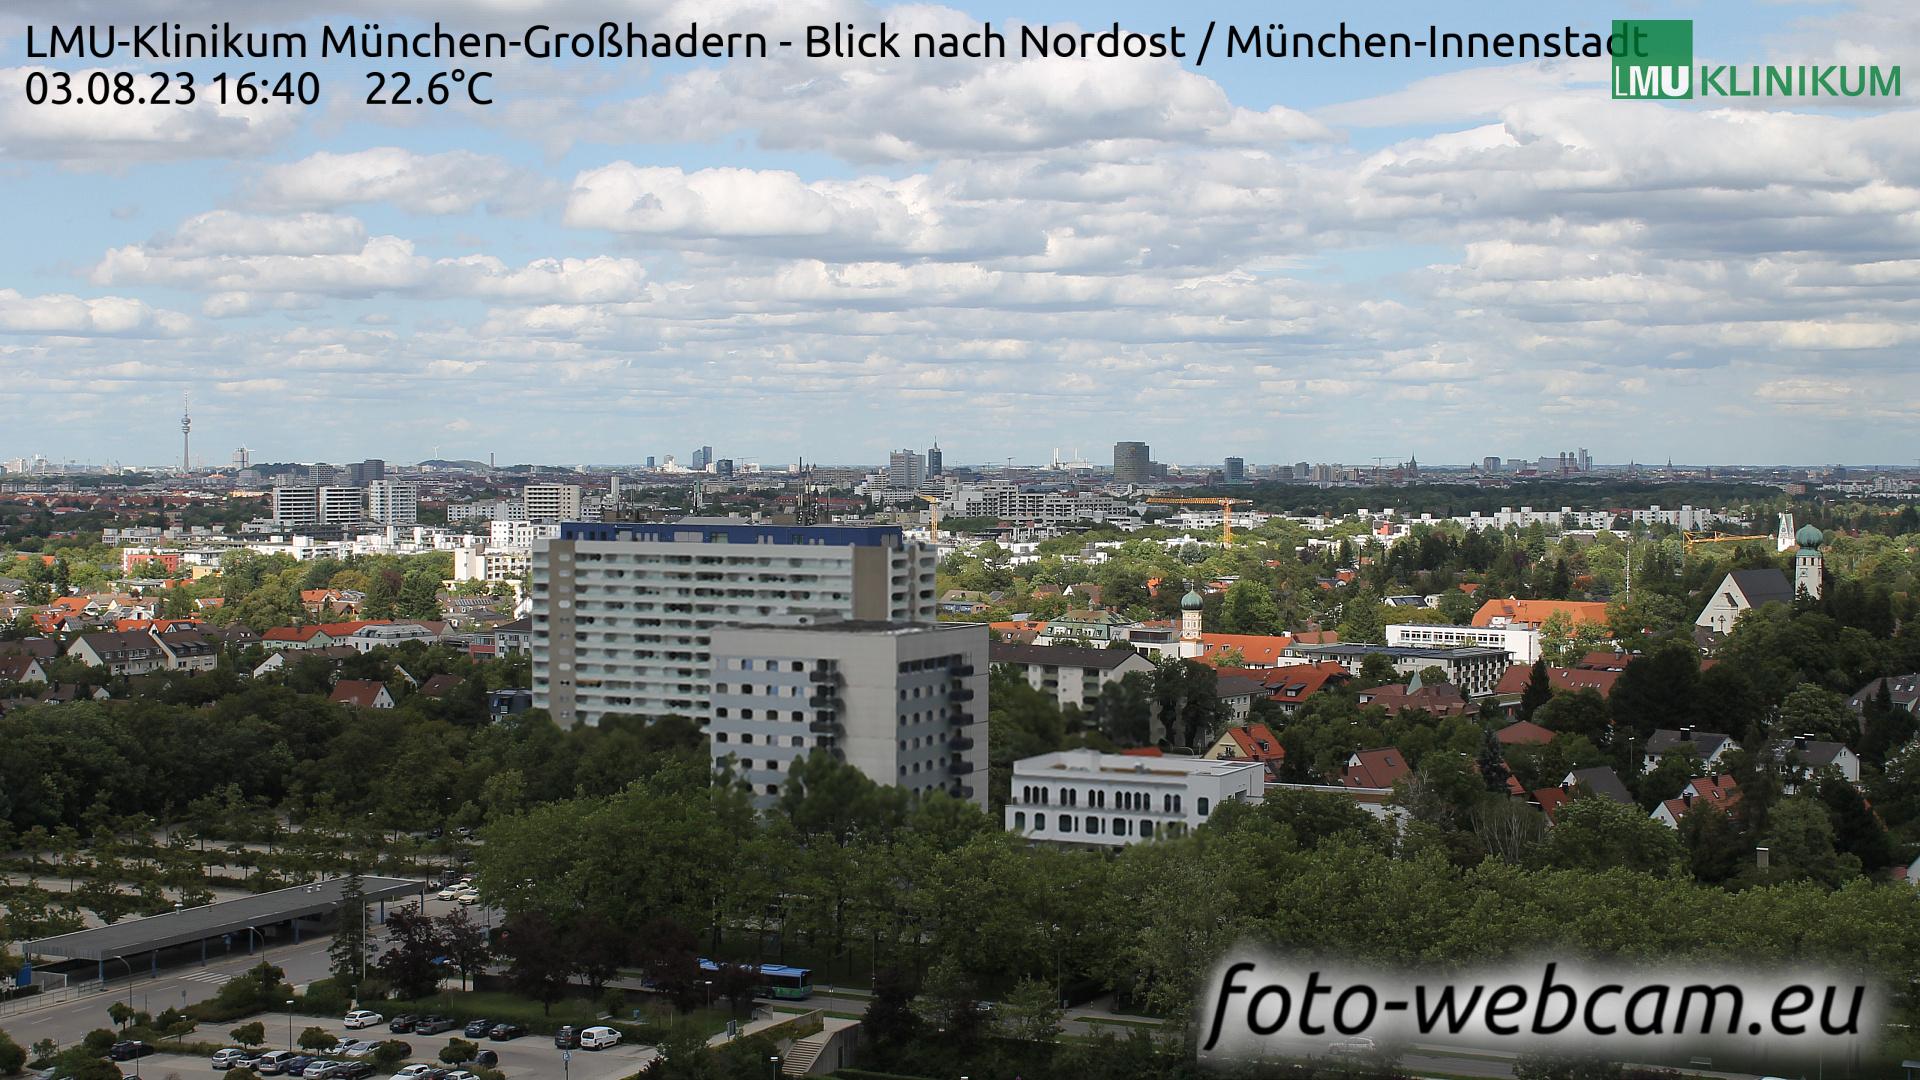 Munich Mon. 16:47